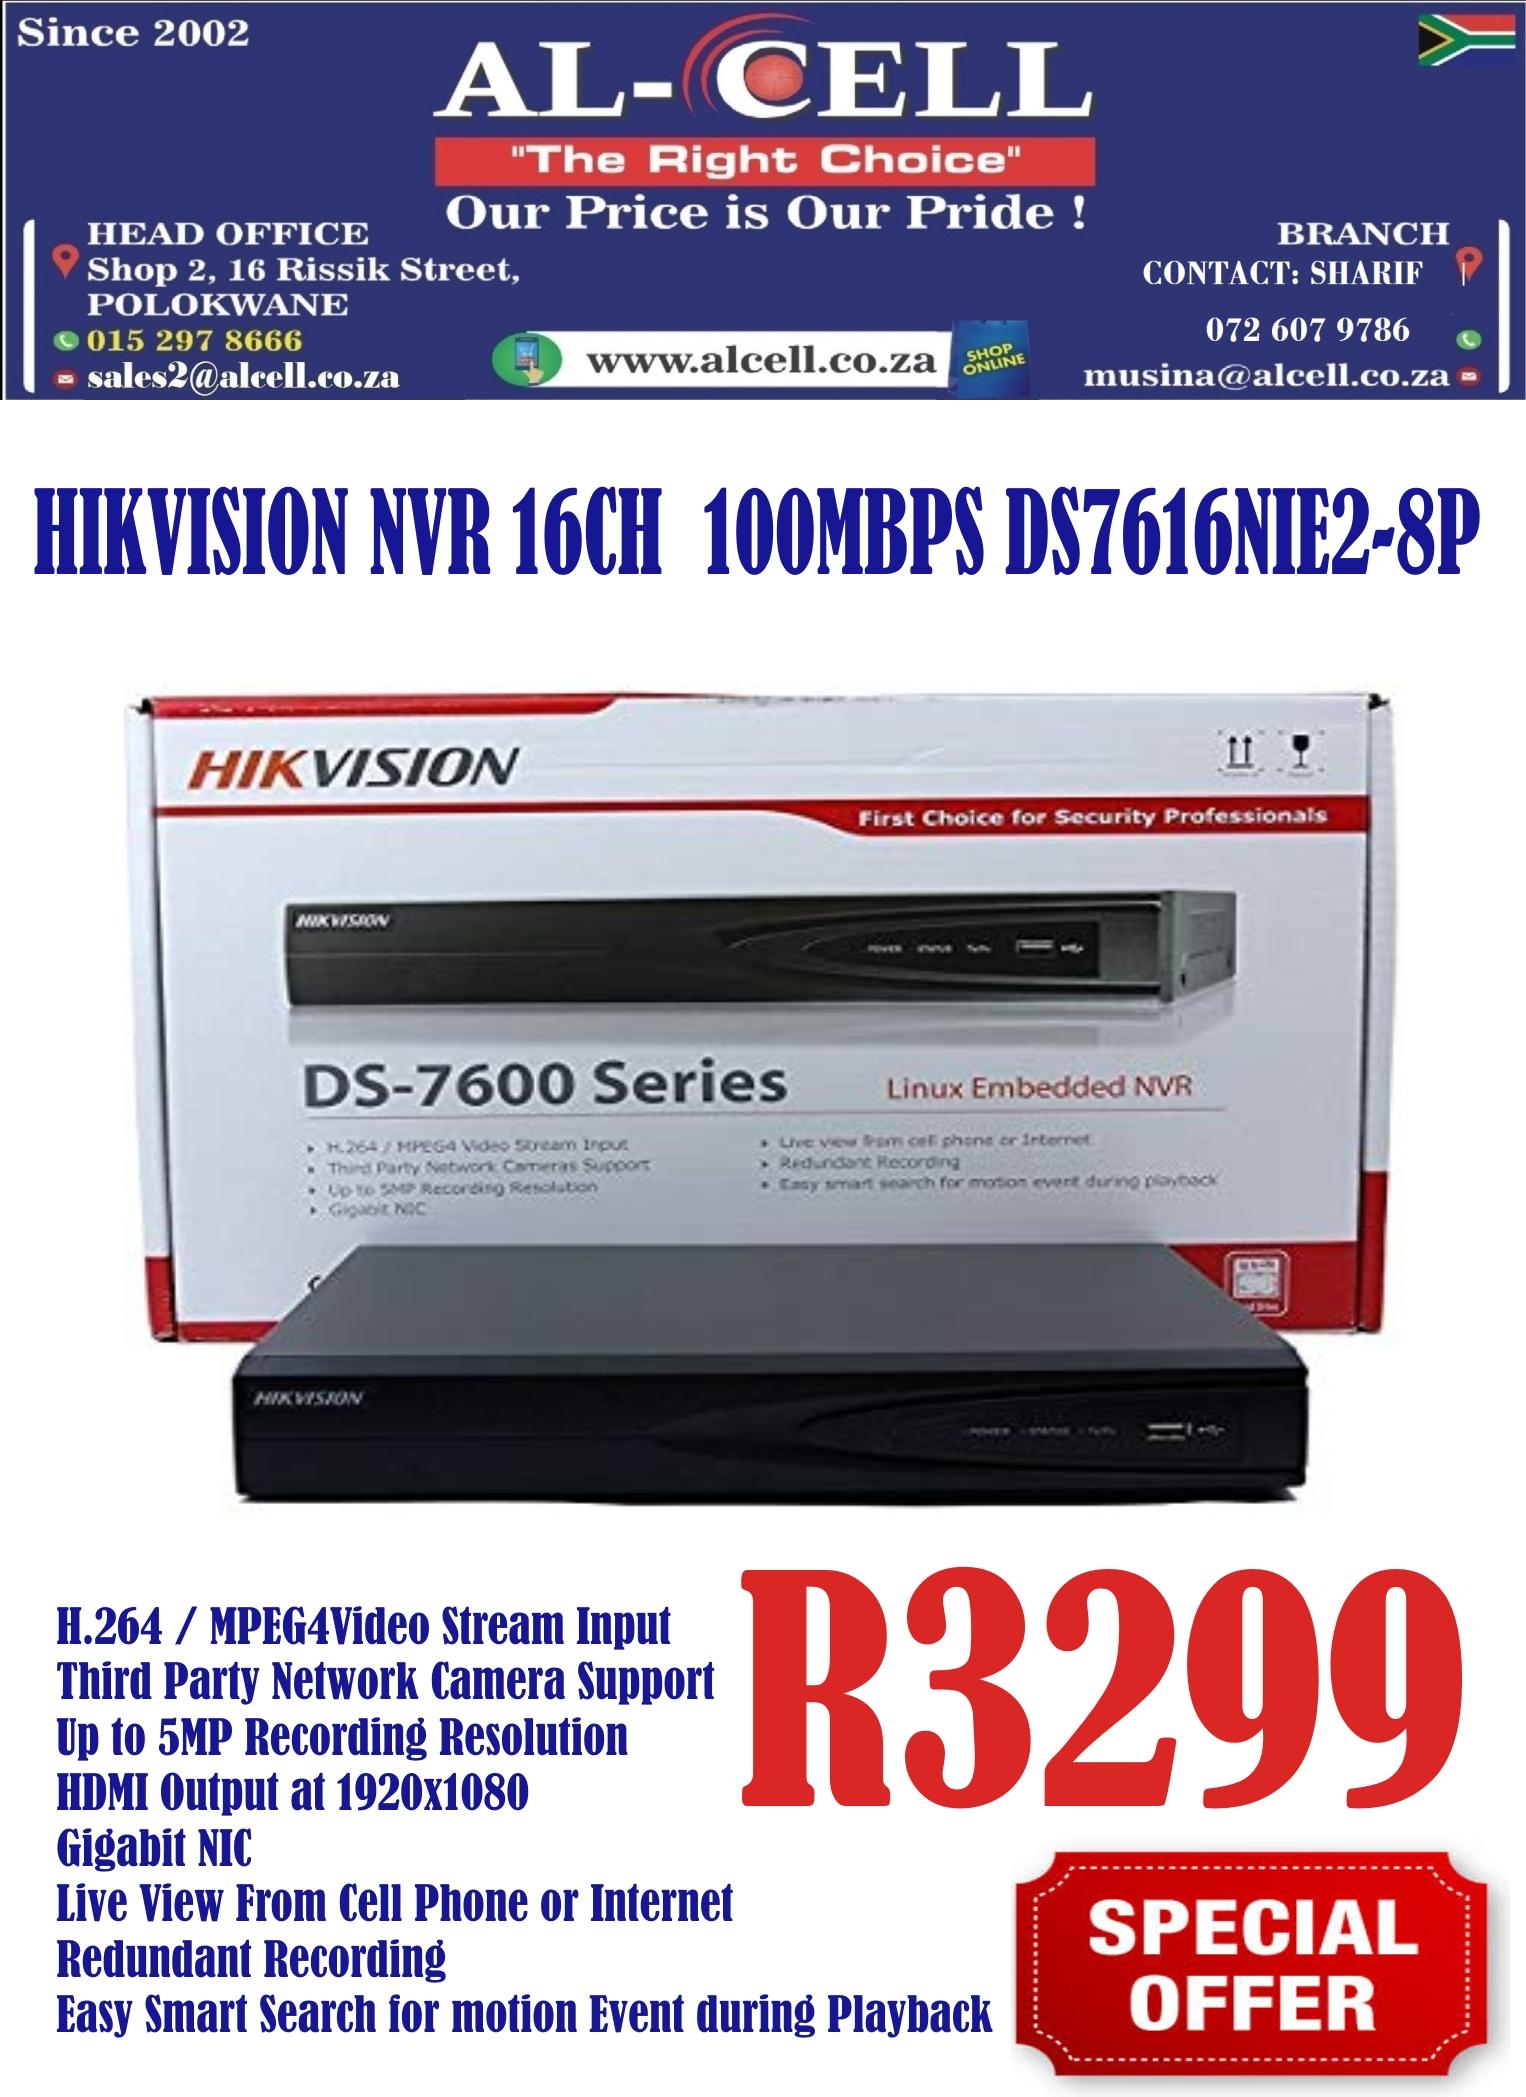 Hikvision 16 Channel NVR 100 MBPS DS7616NIE2-8P | Junk Mail